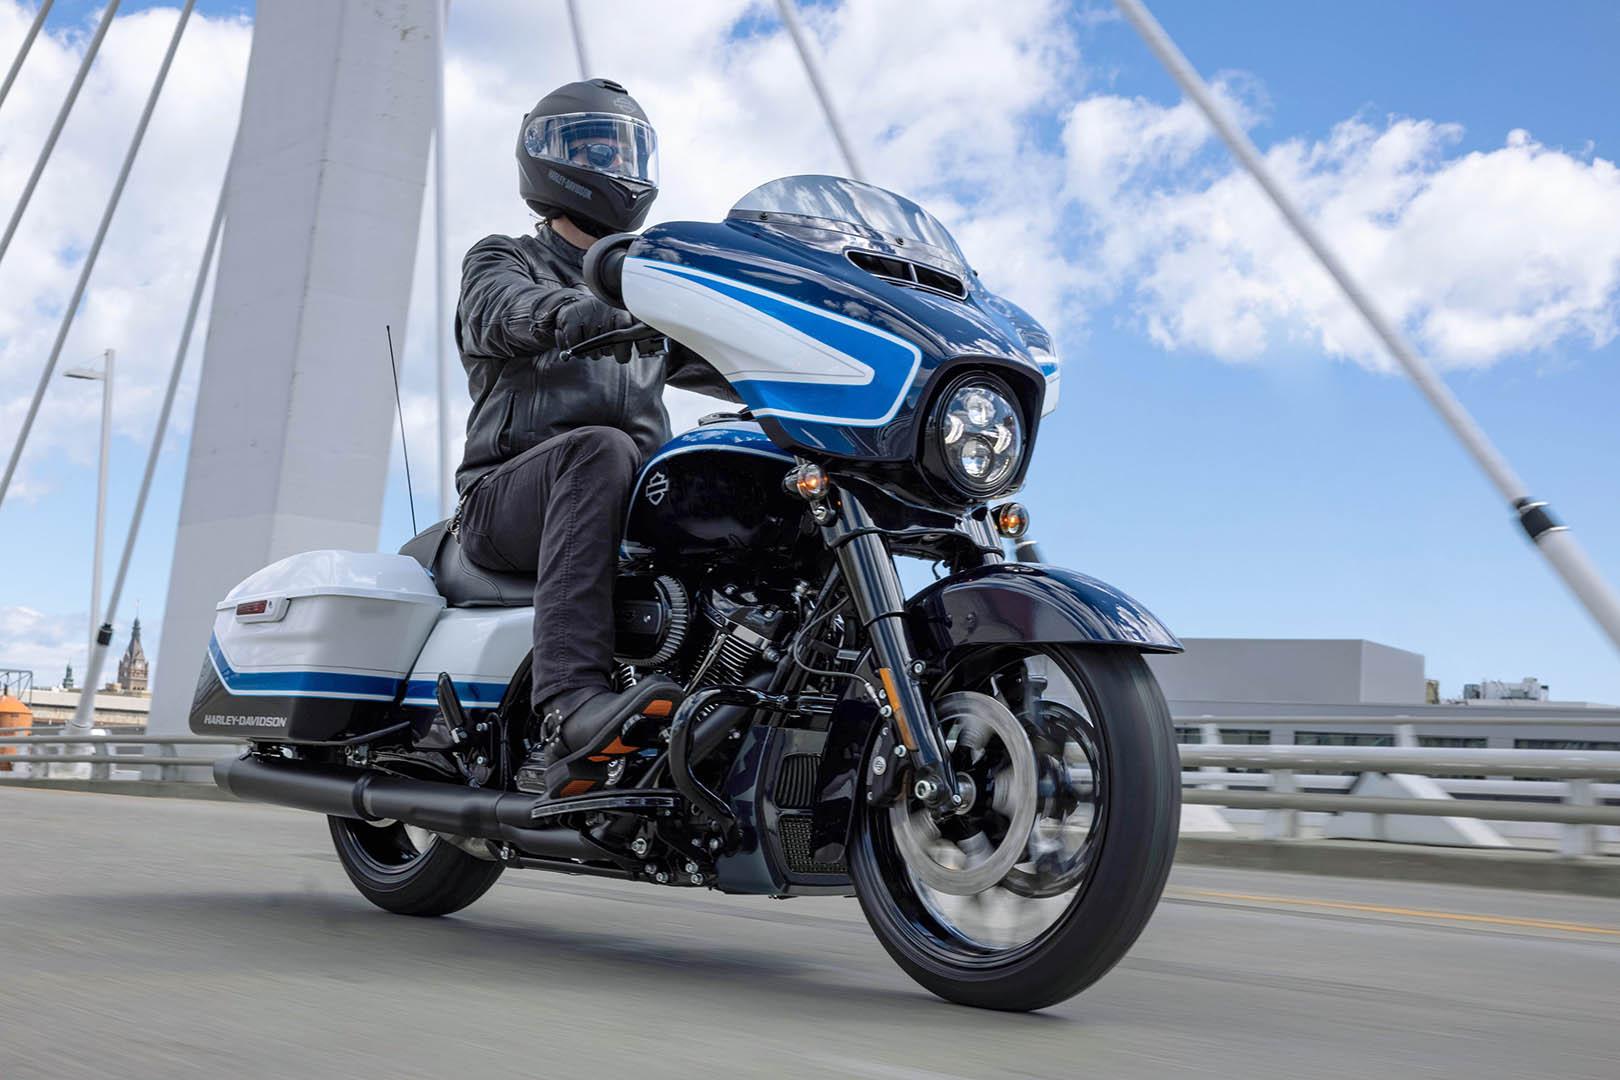 2021 Harley-Davidson Street Glide Special Arctic Blast Limited Edition